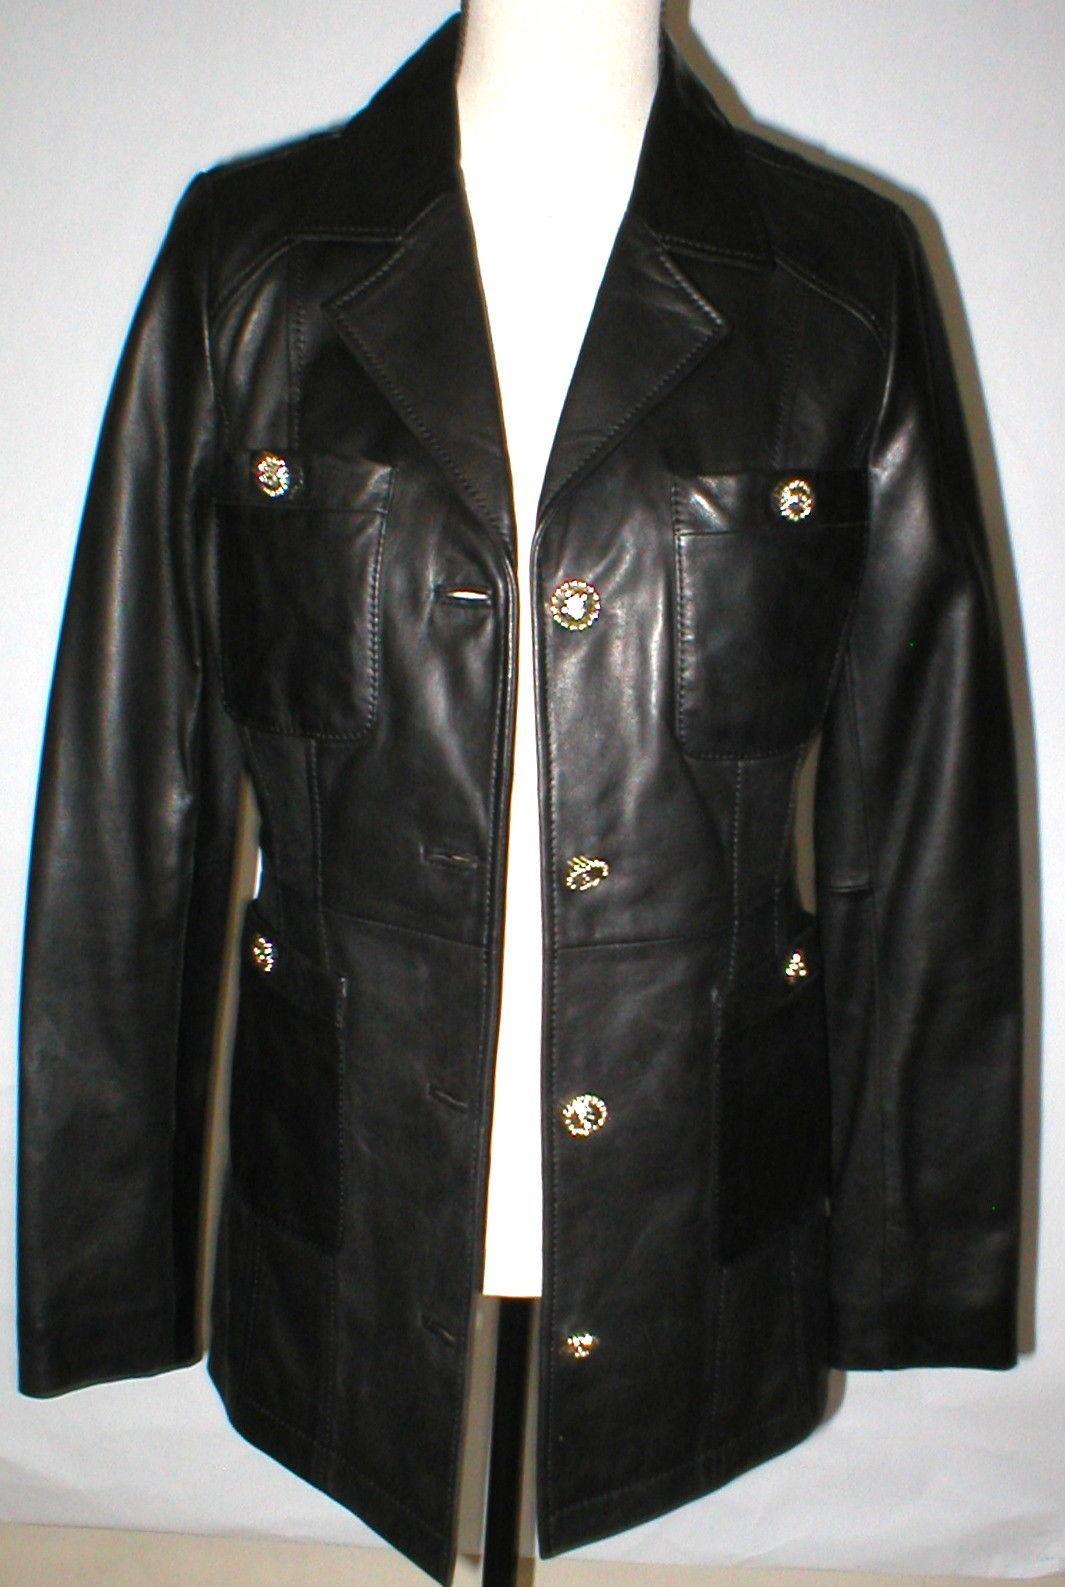 New Womens S Soft Karl Lagerfeld Paris Leather Jacket Black Silver Designer Lamb image 2